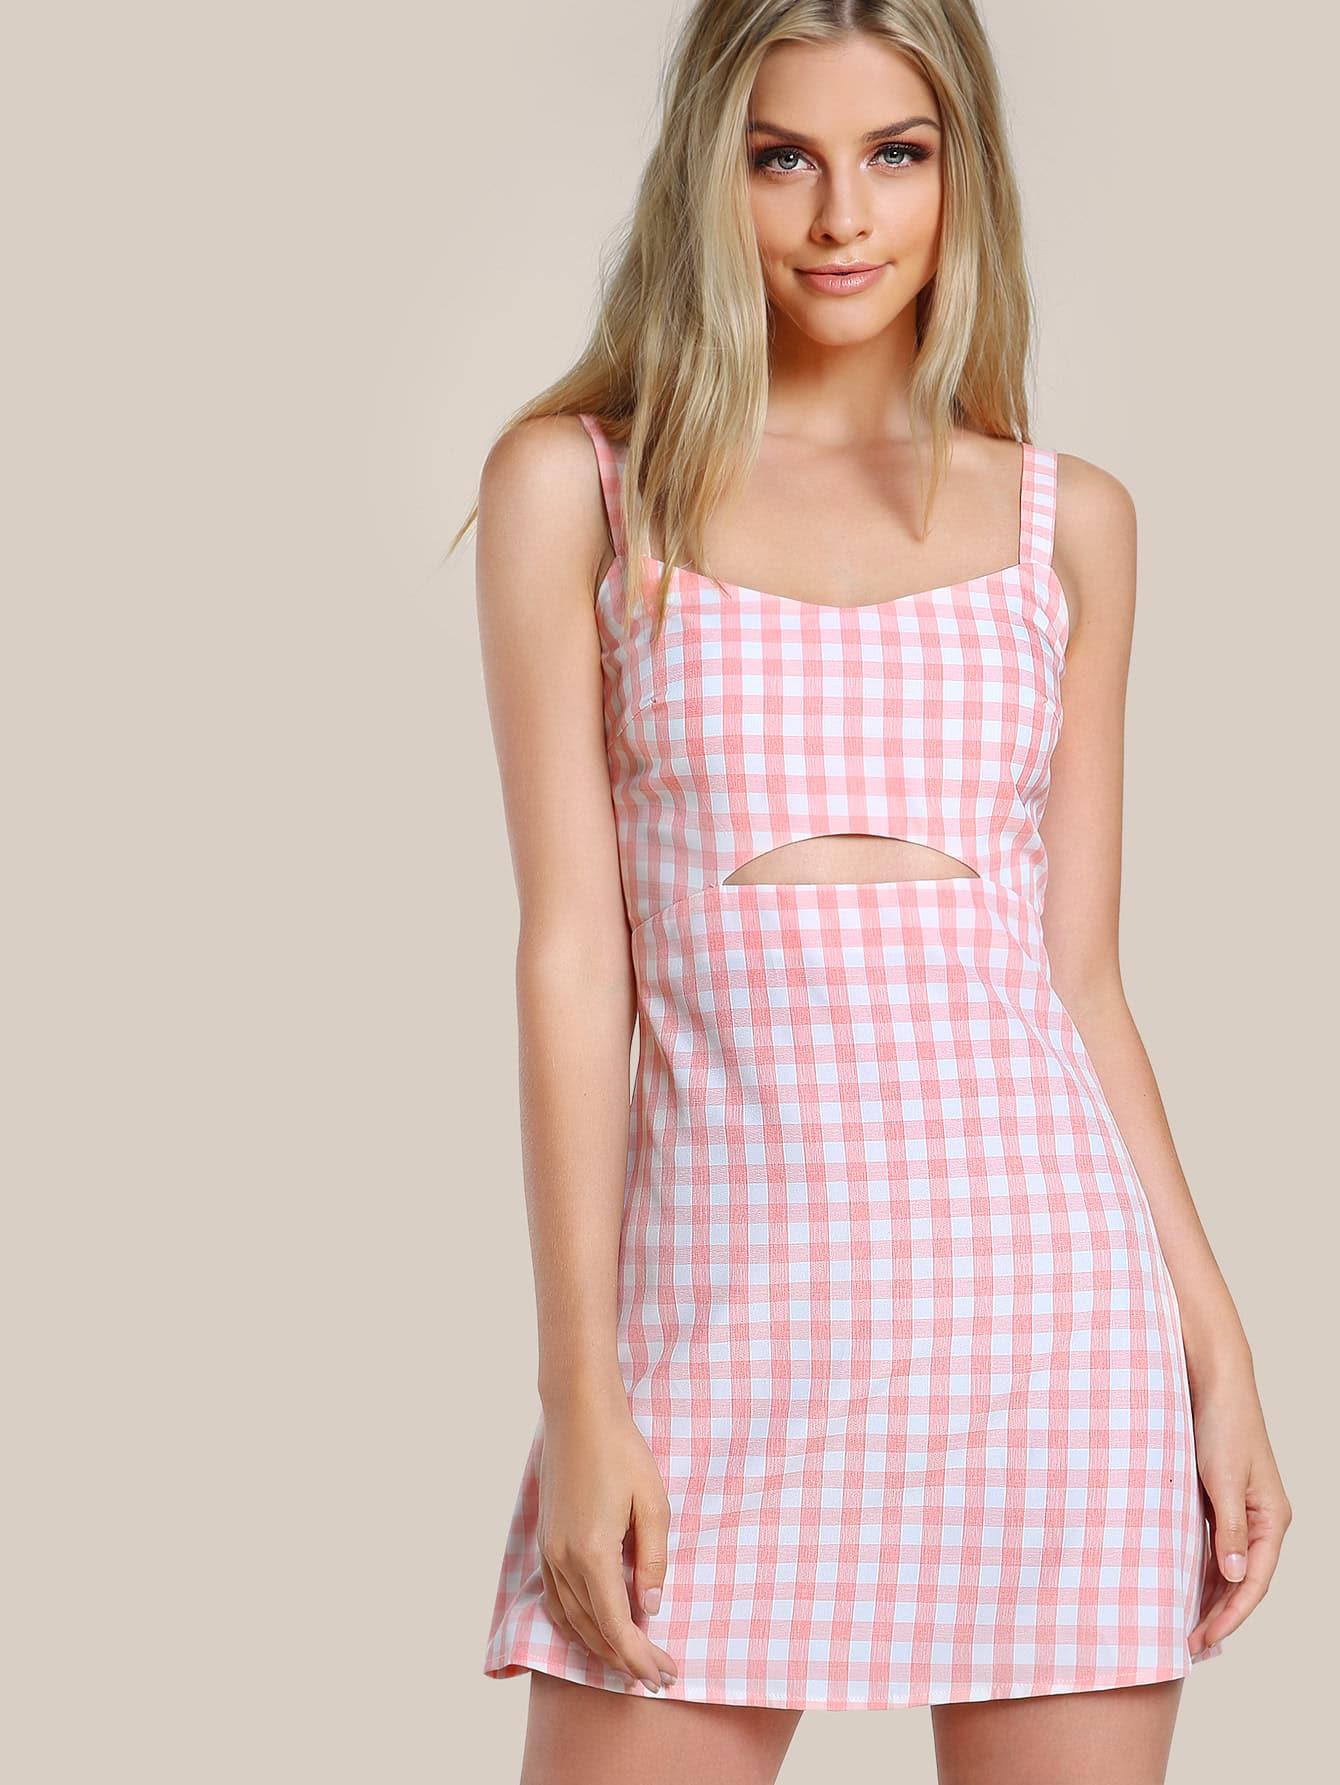 Cutout Midriff Gingham Pinafore Dress SheInSheinside